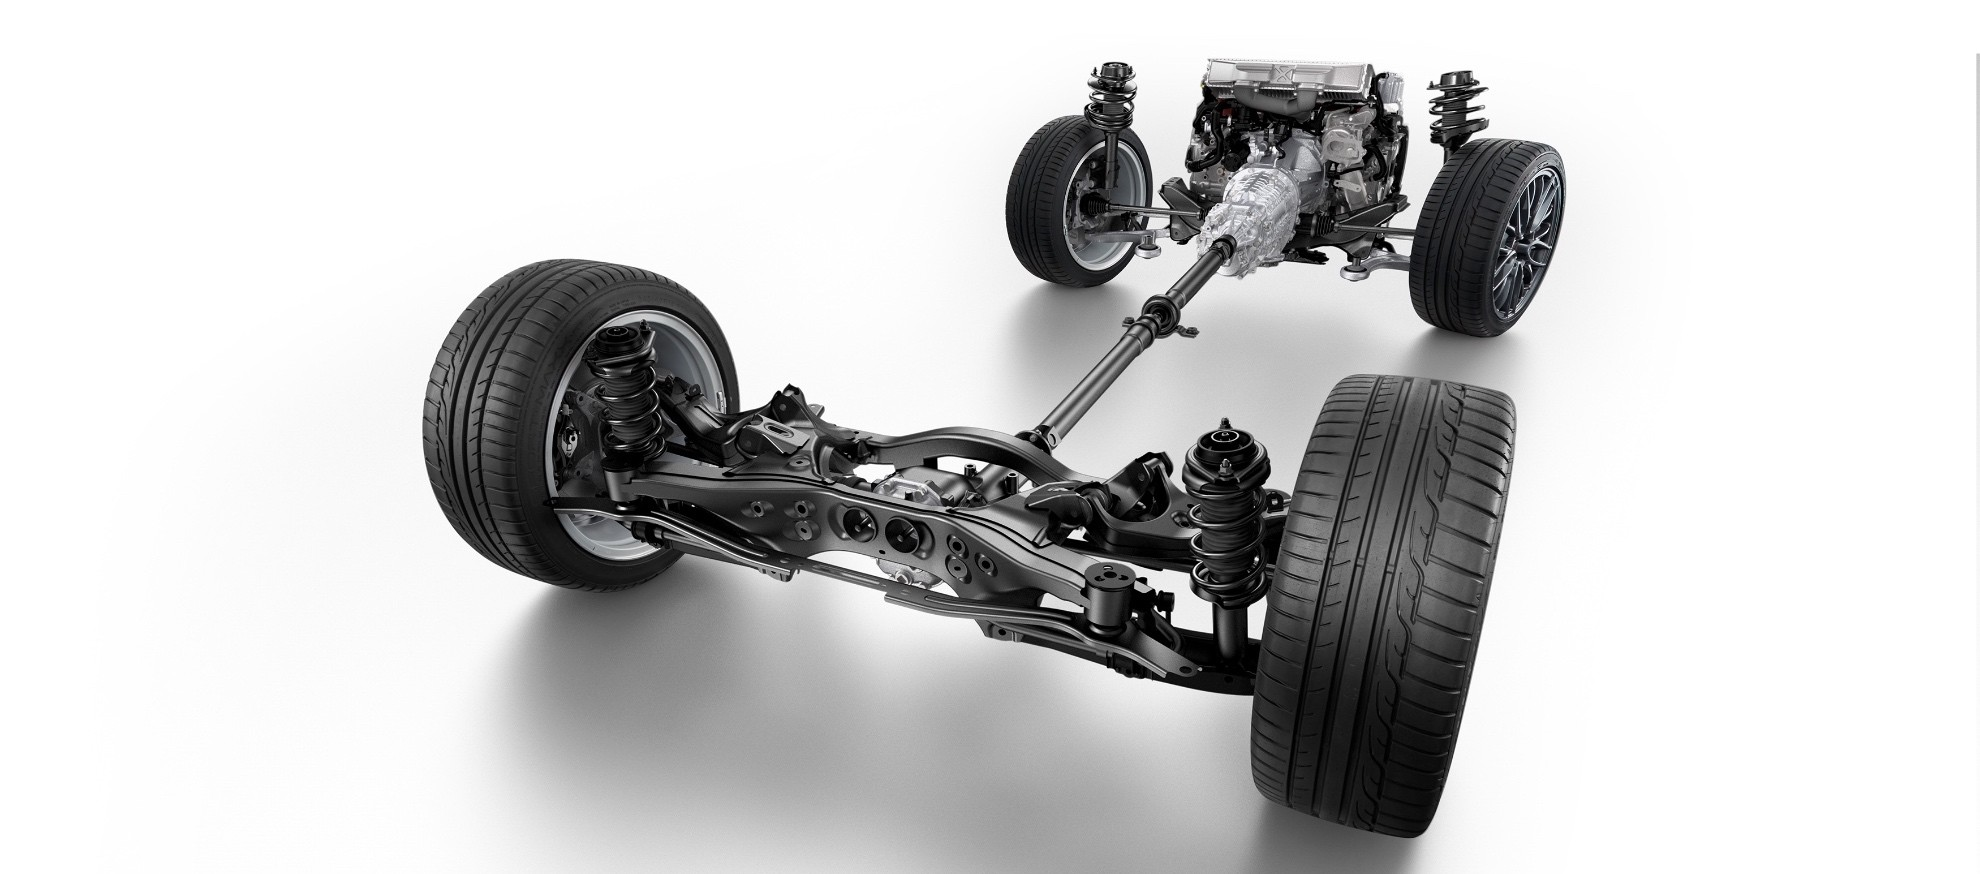 3 All Wheel Drive Axle : Subaru symmetrical all wheel drive four decades of